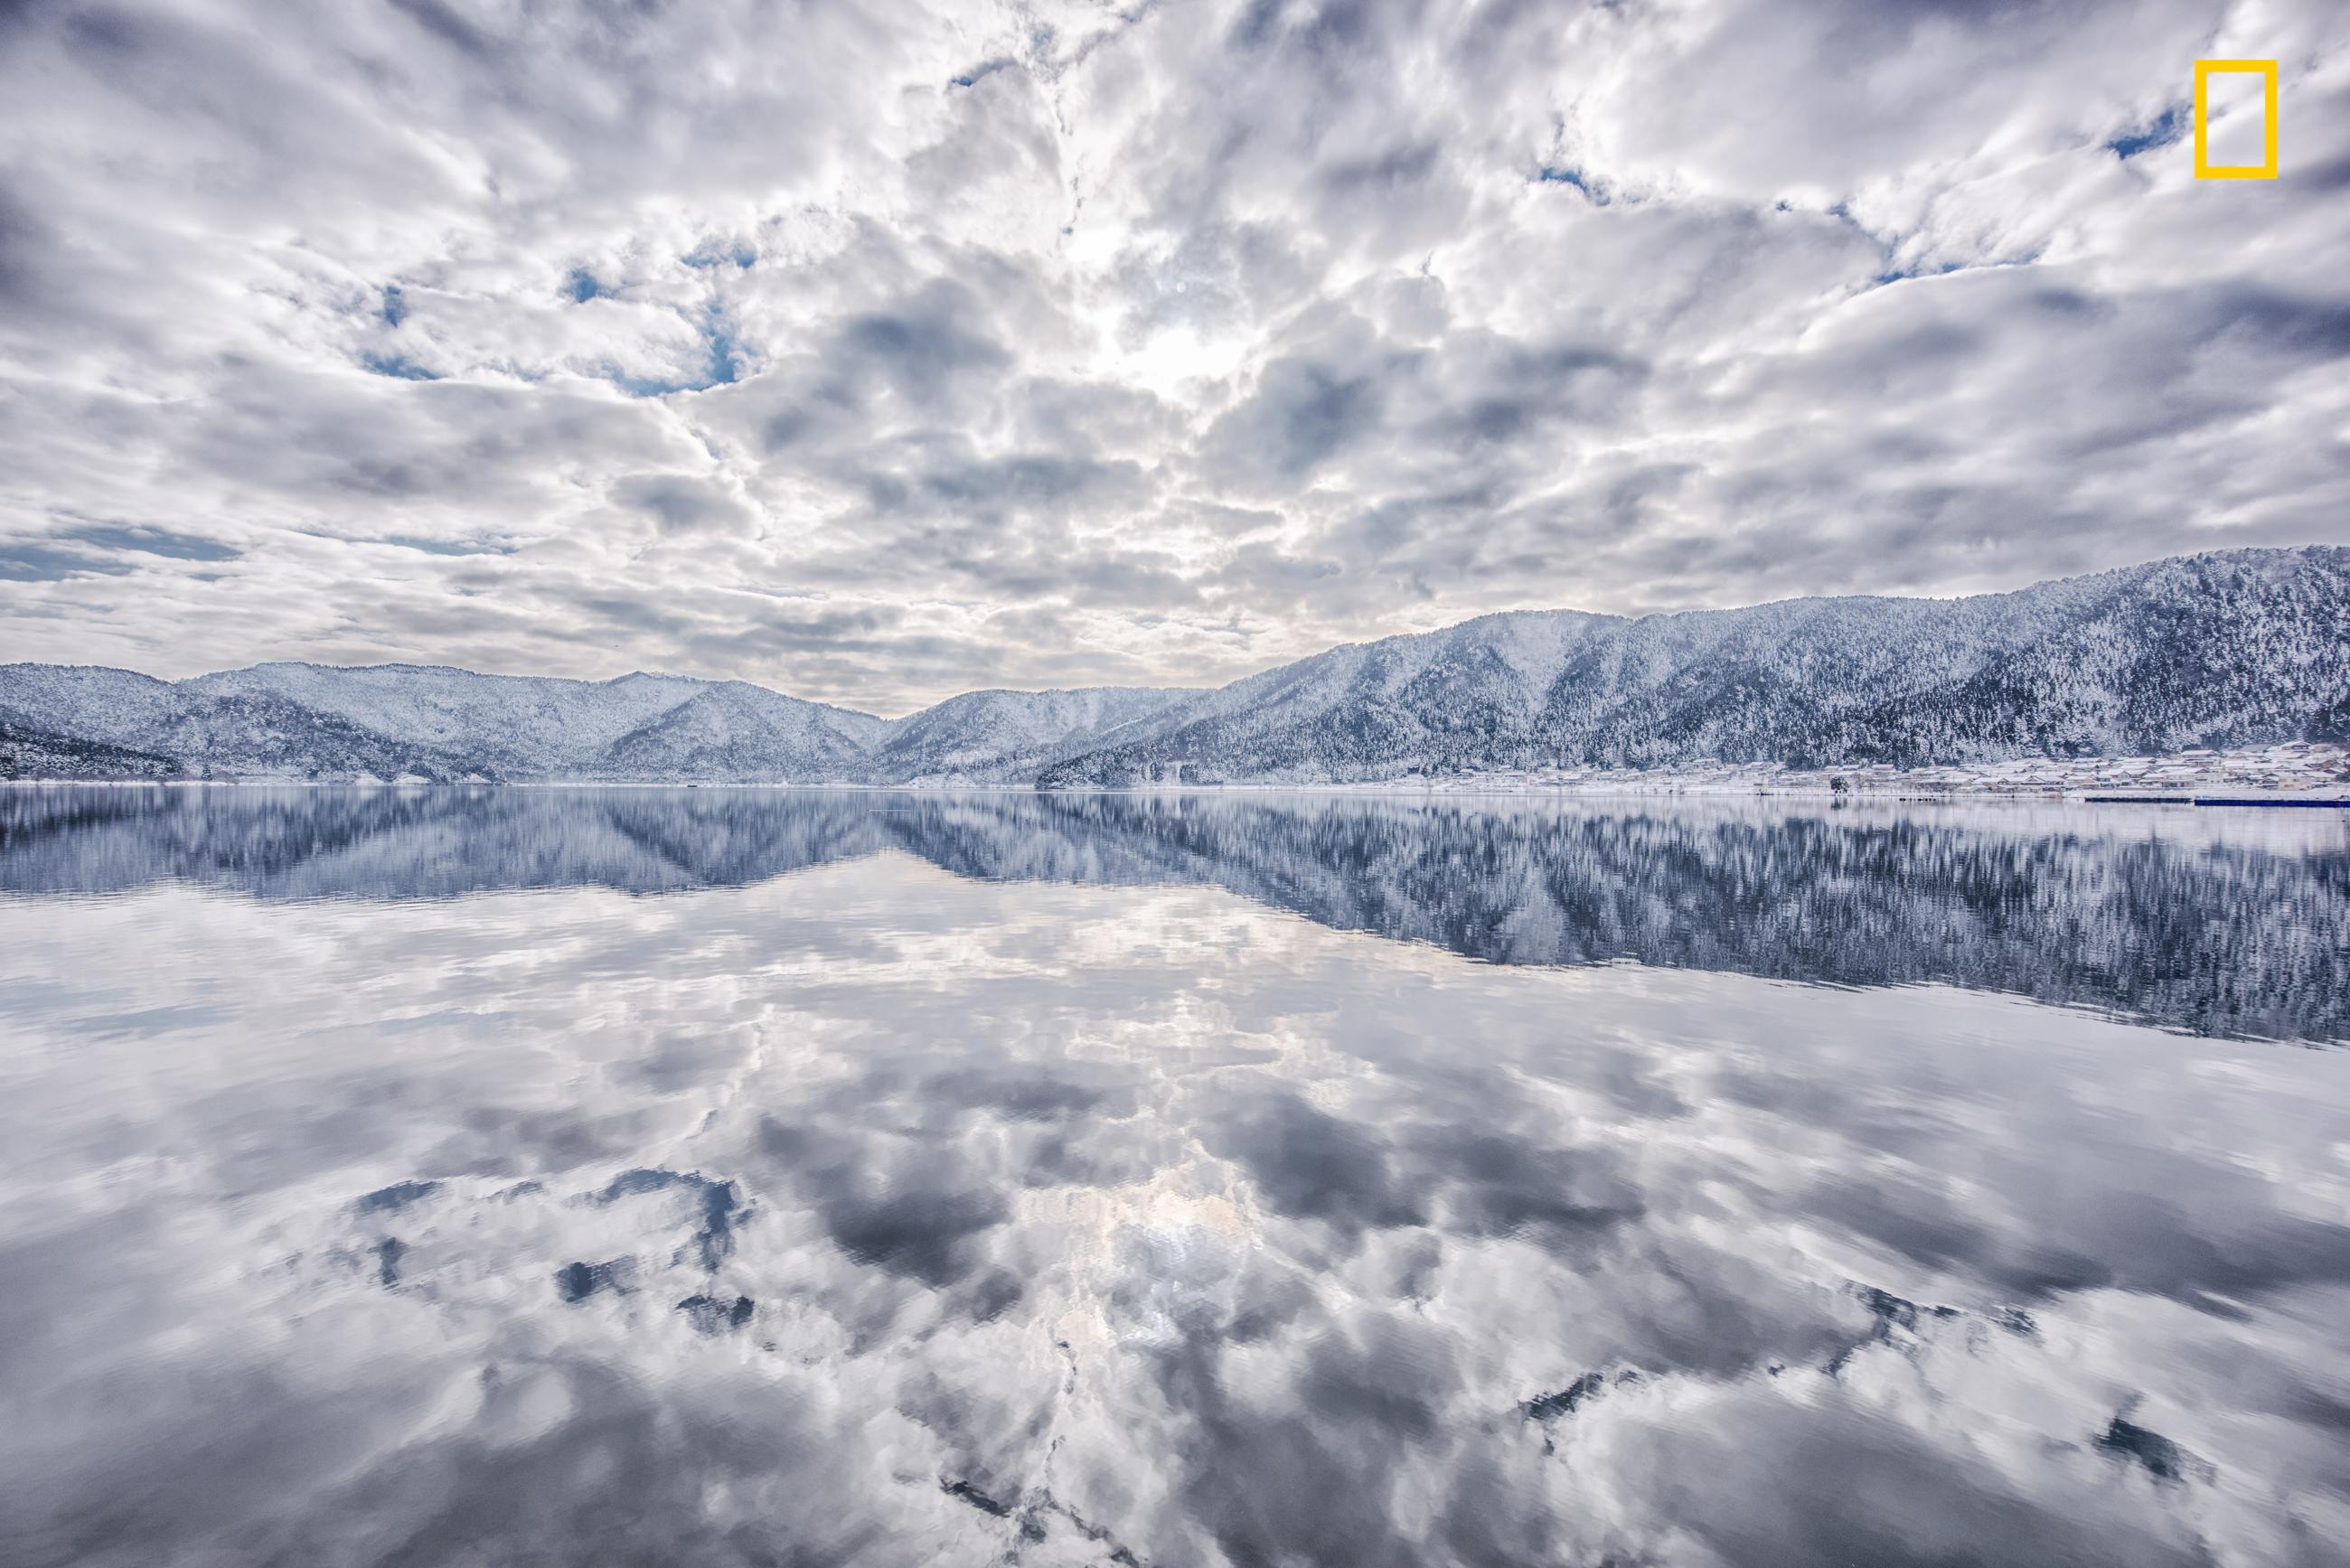 Nature Landscape Photography Camera